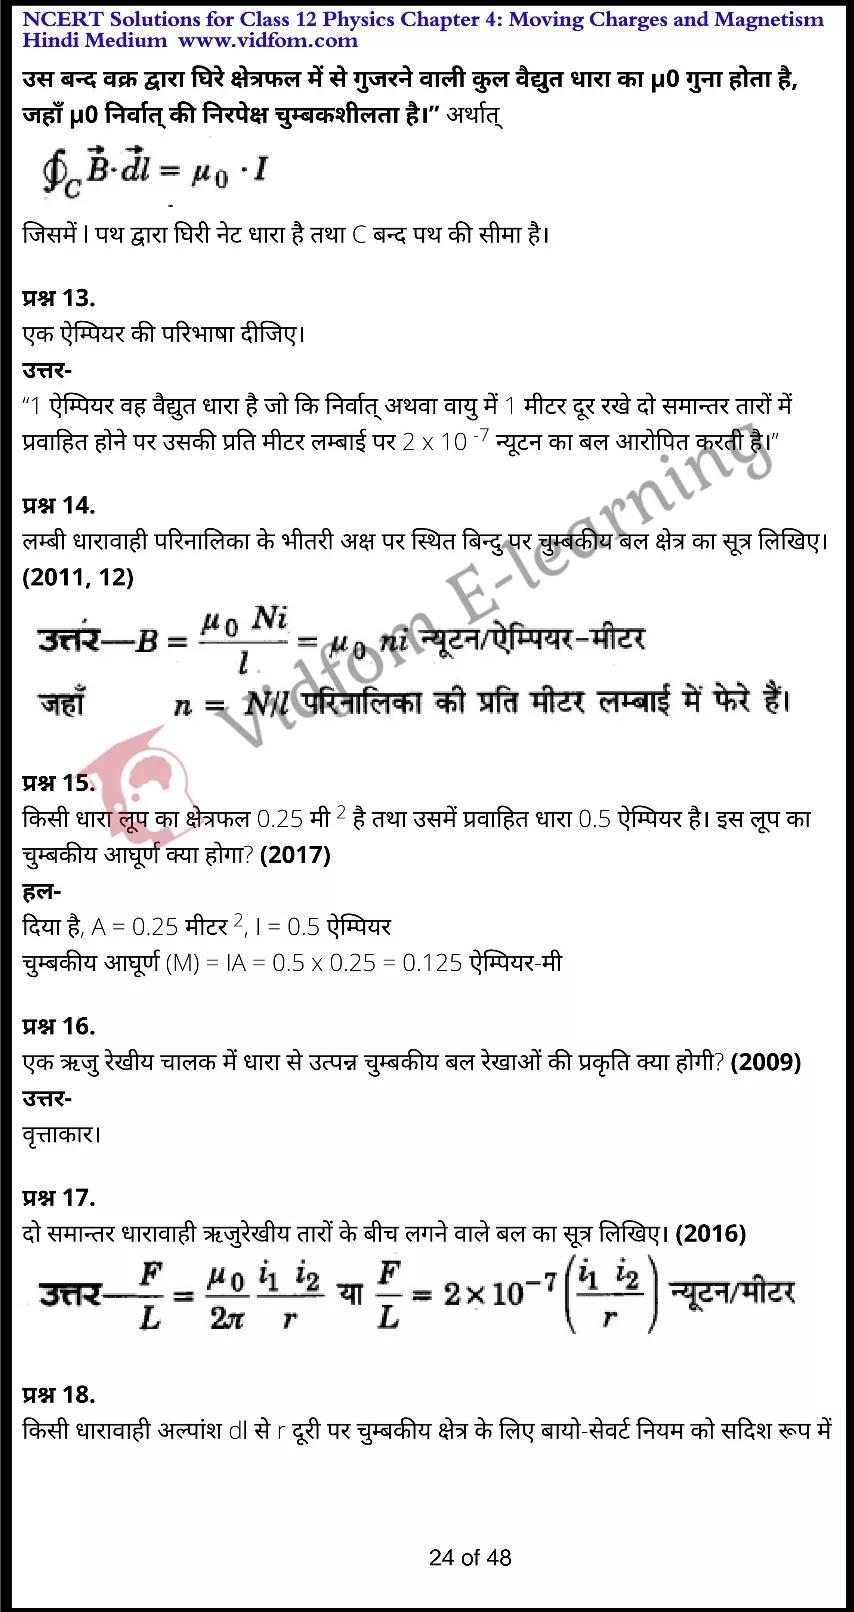 class 12 physics chapter 4 light hindi medium 24